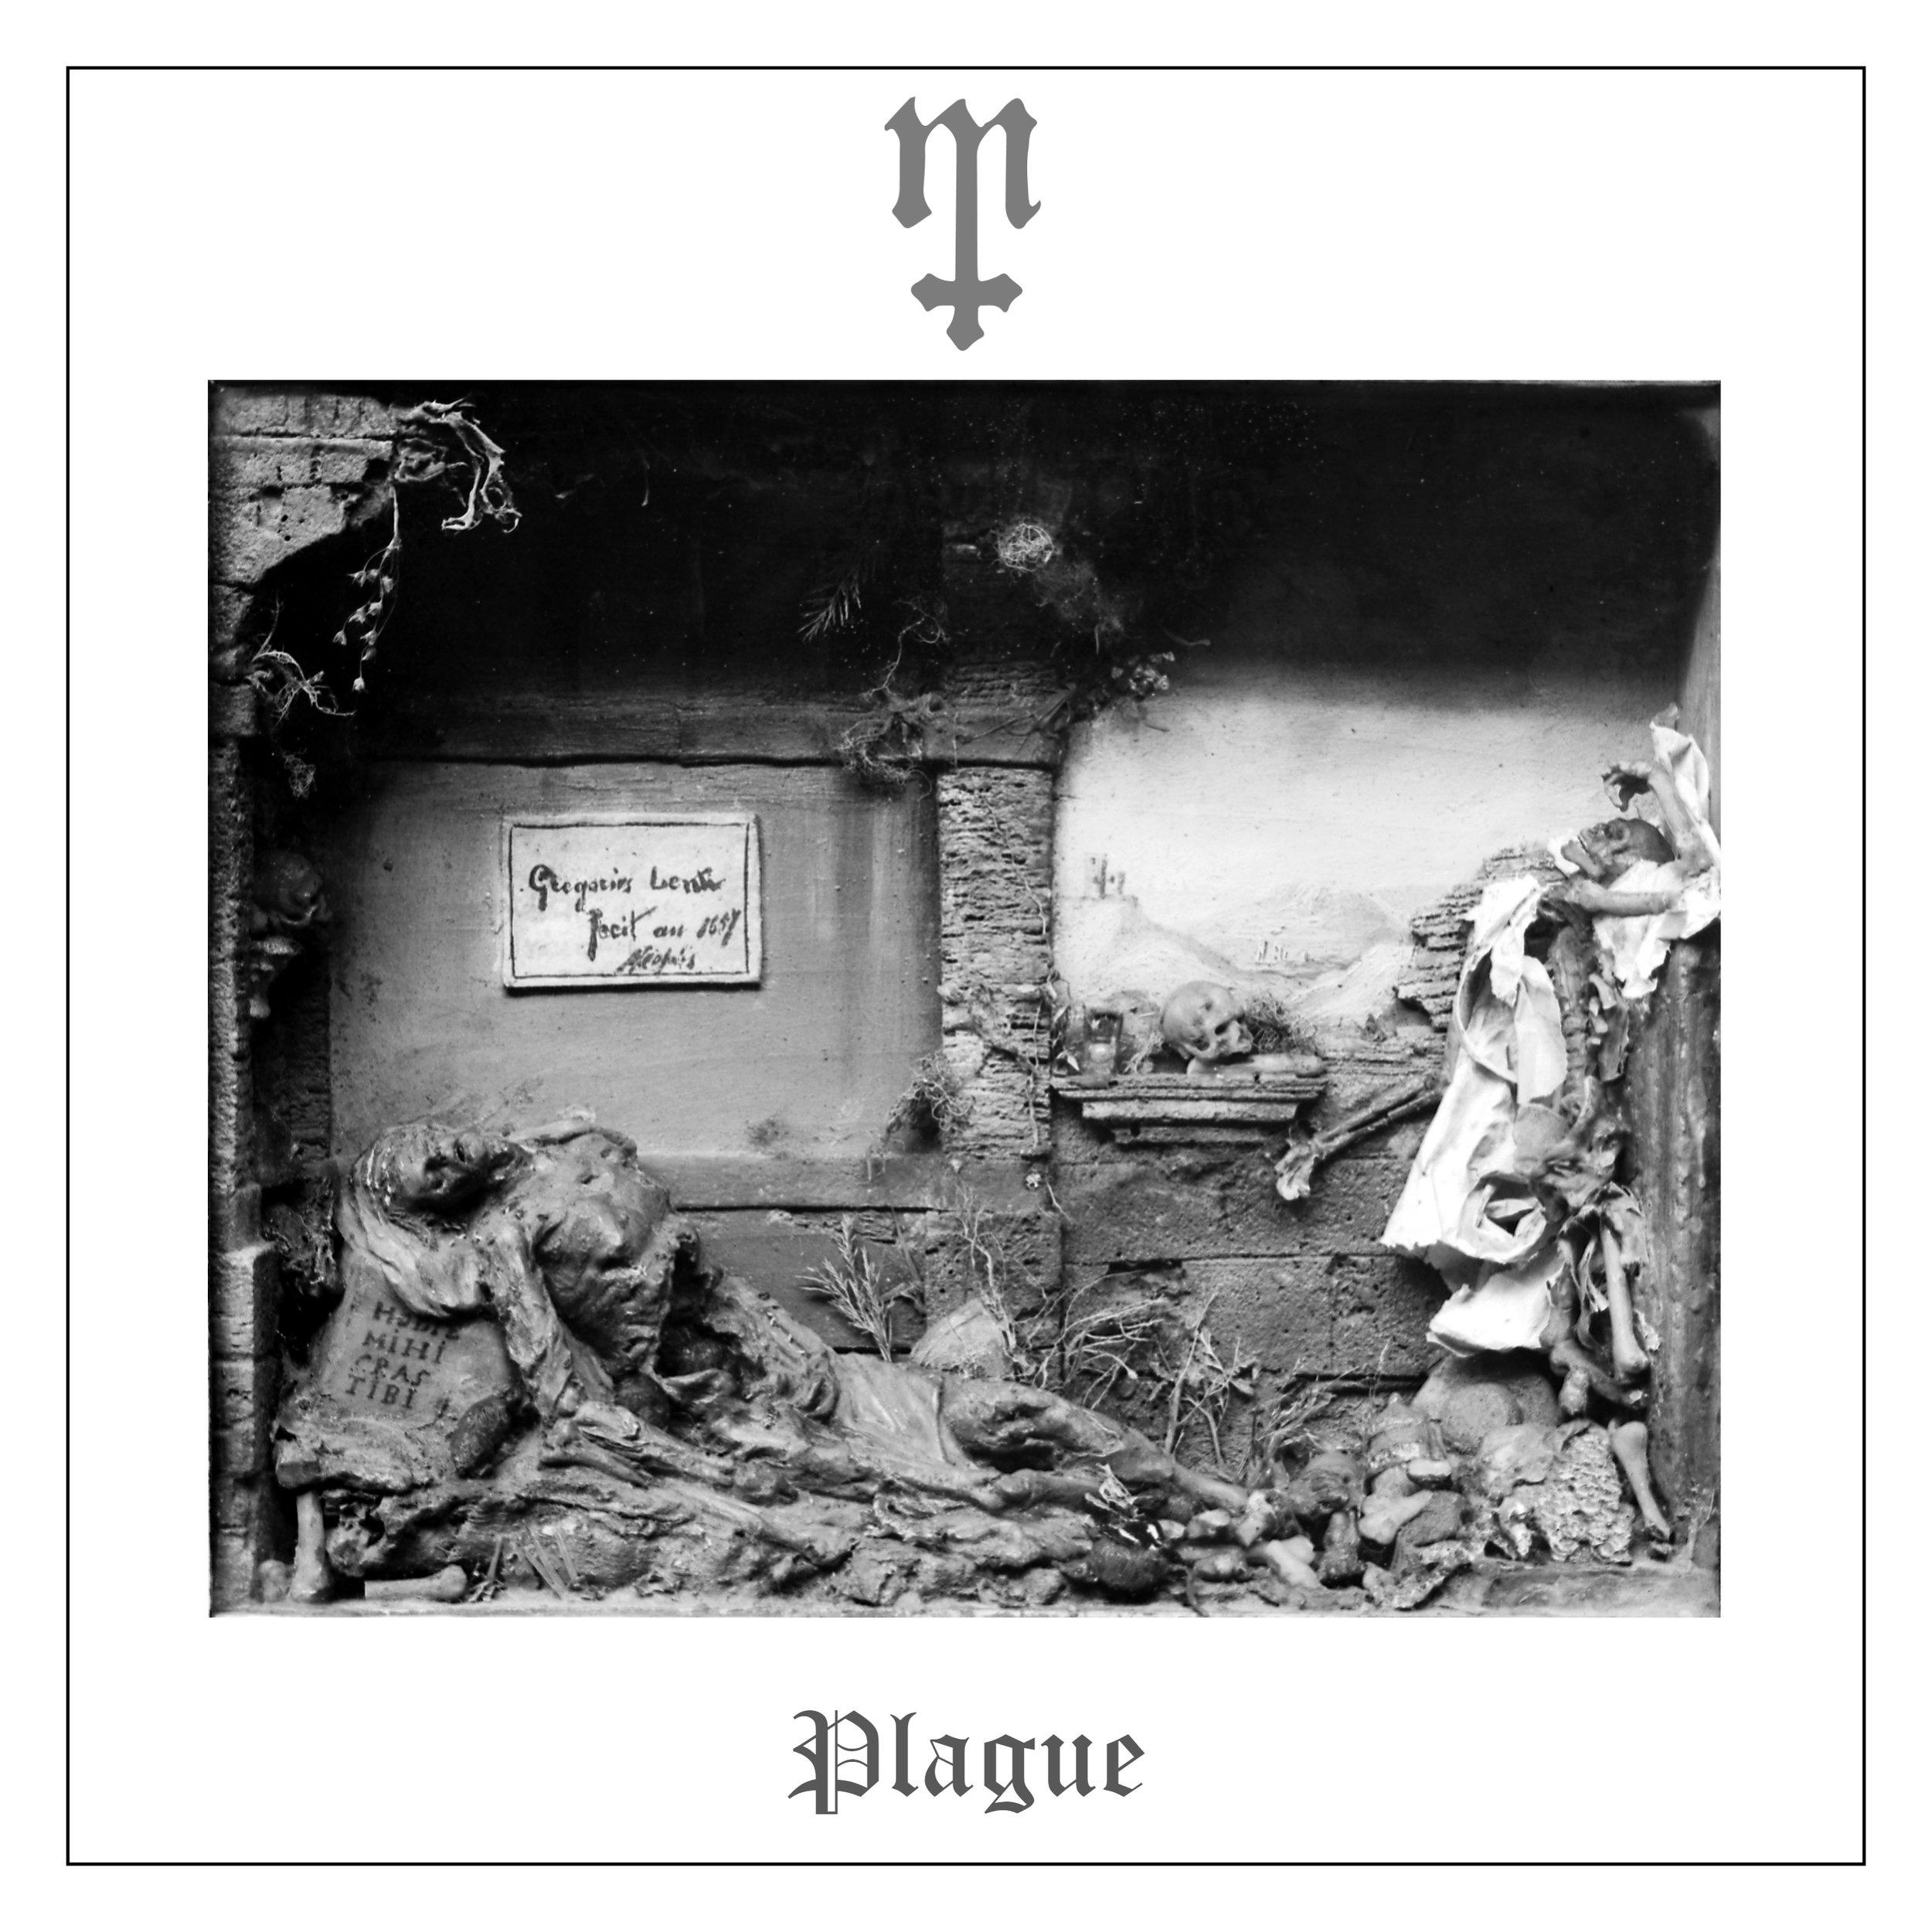 Plague Tracklisting:   1: Hellcircle 2: Bubonic 3: Brainbleed 4: Quarantine 5: Vermin 6: Torture 7: Weep 8: Black Death